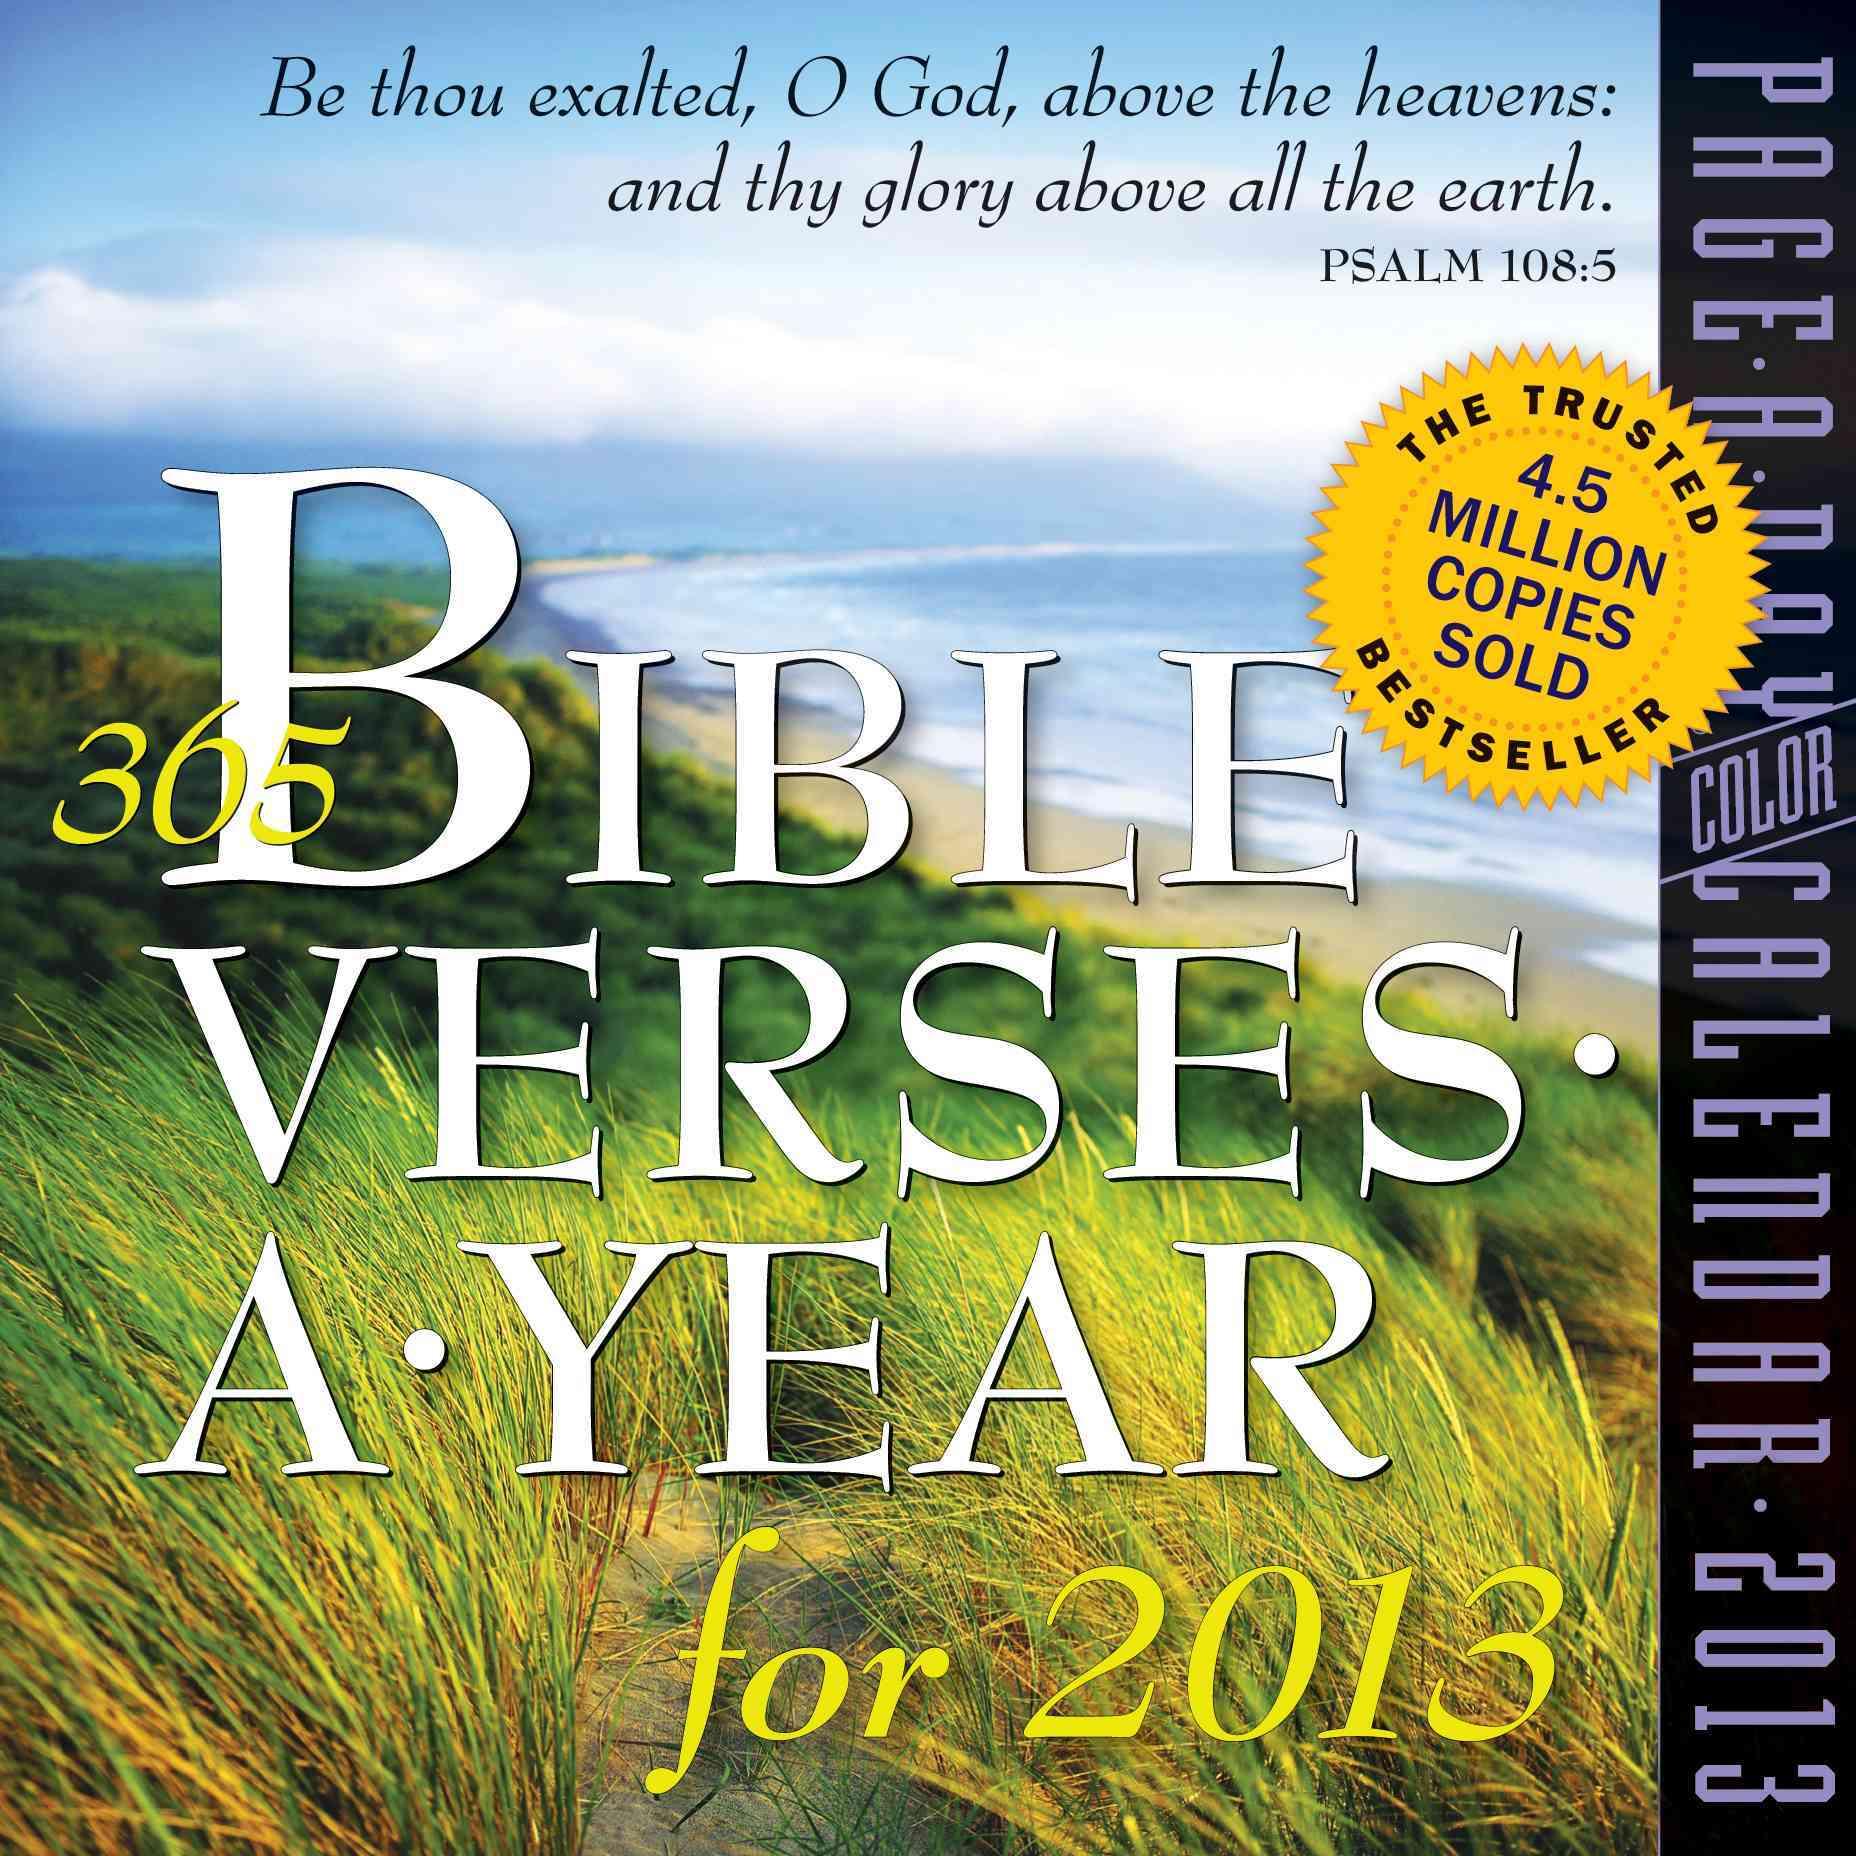 365 Bible Verses a Year 2013 Calendar (Calendar)